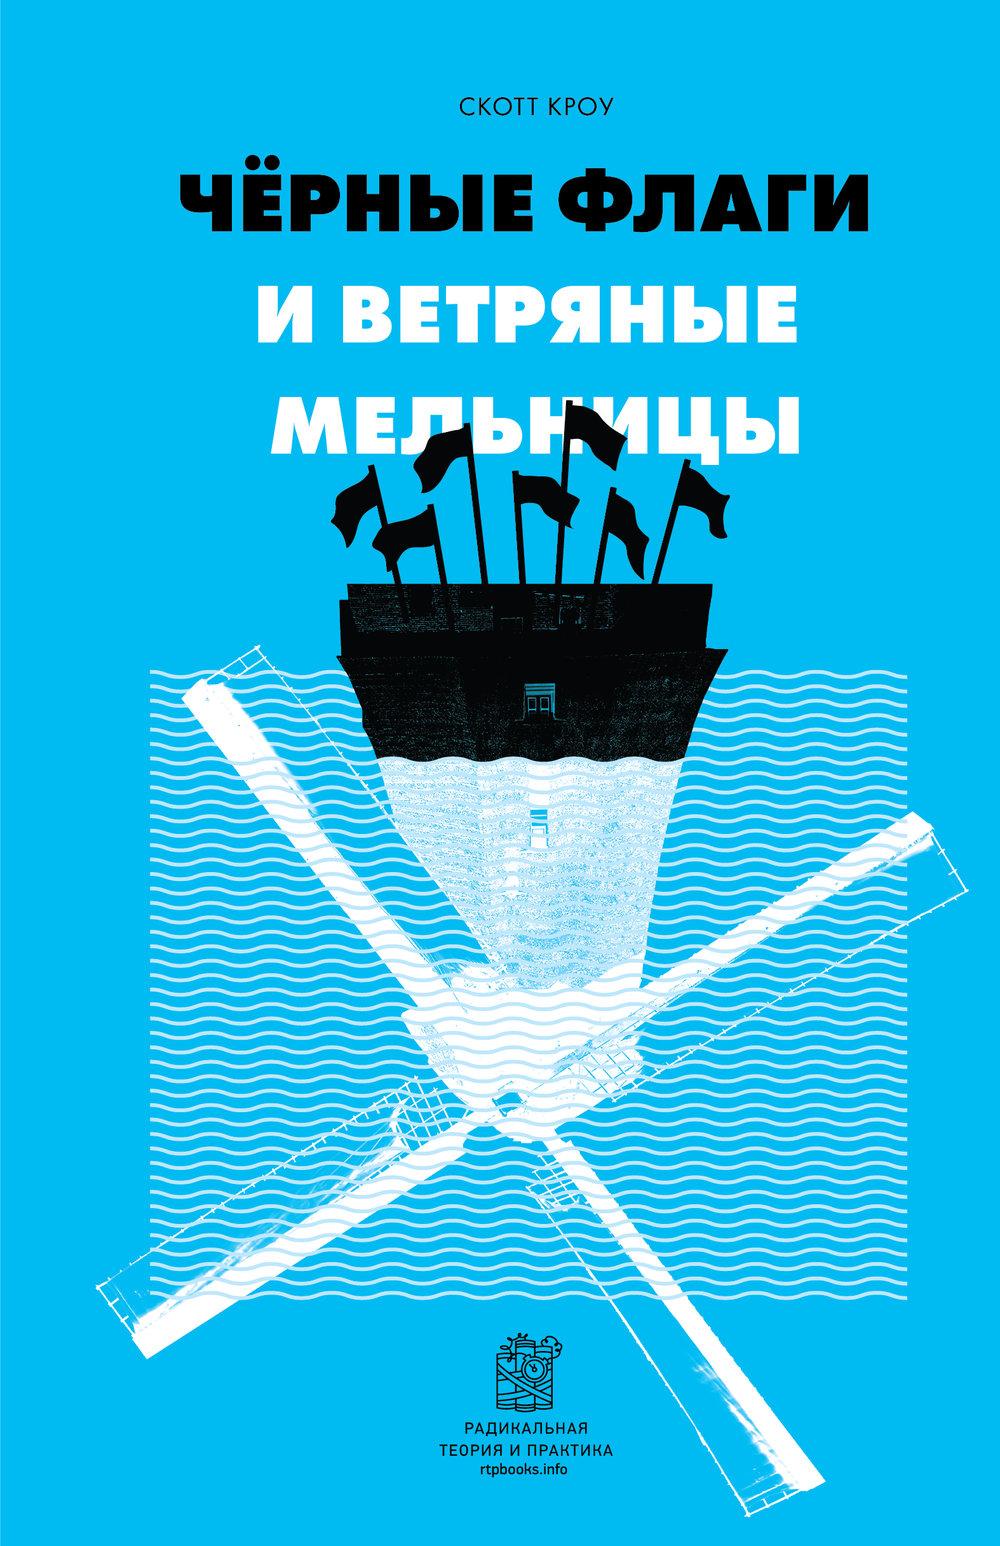 Author. Russian ed. RTP Books 2017